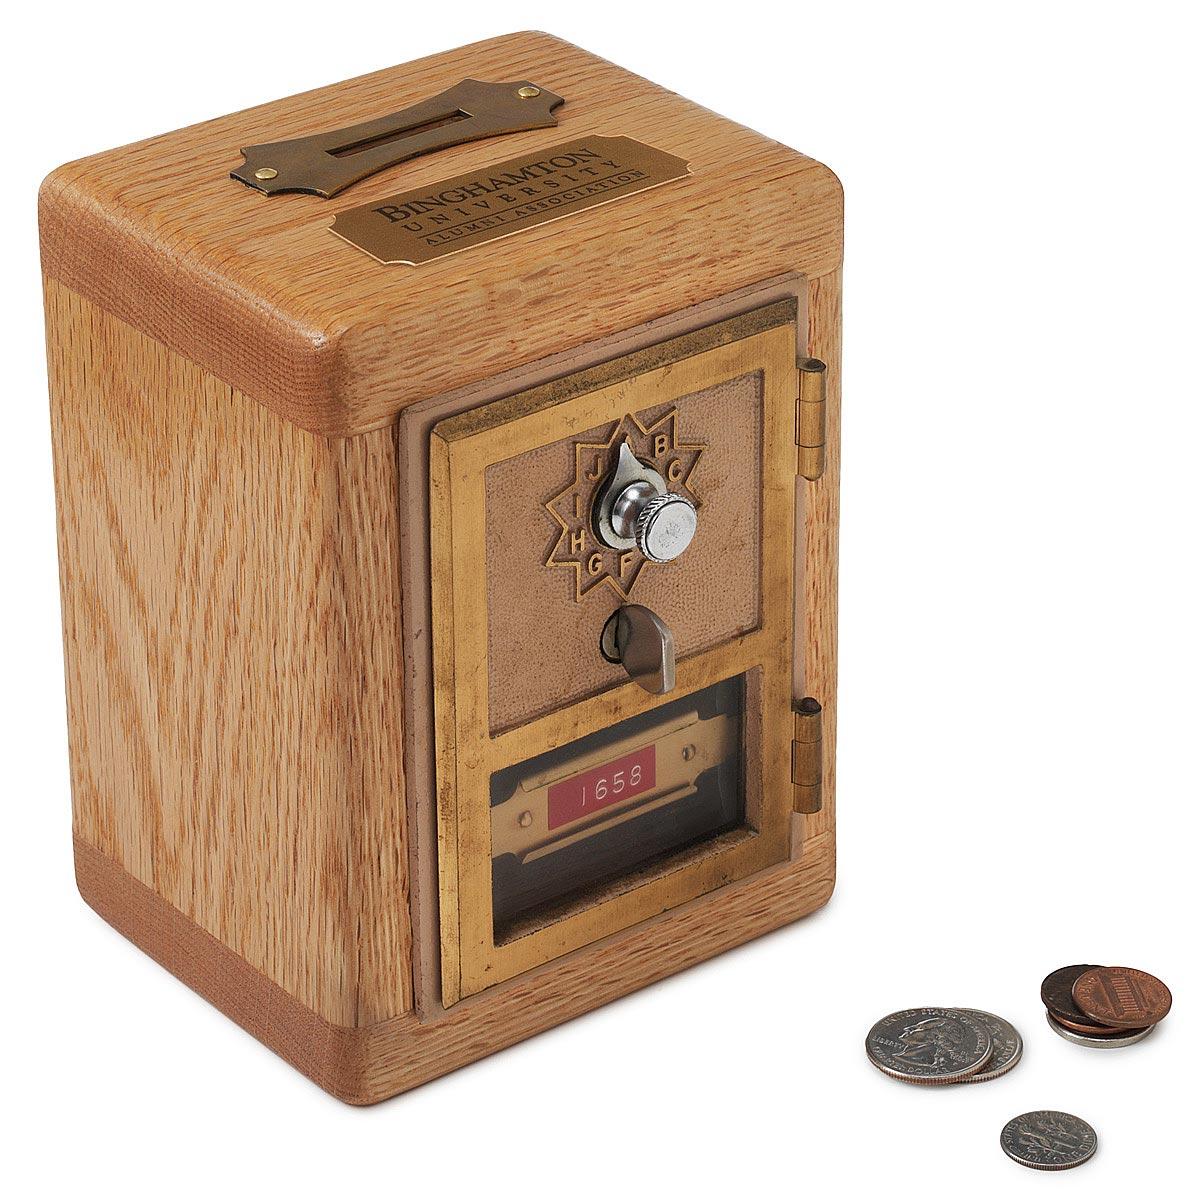 Binghamton University Bank Antique Vault Savings